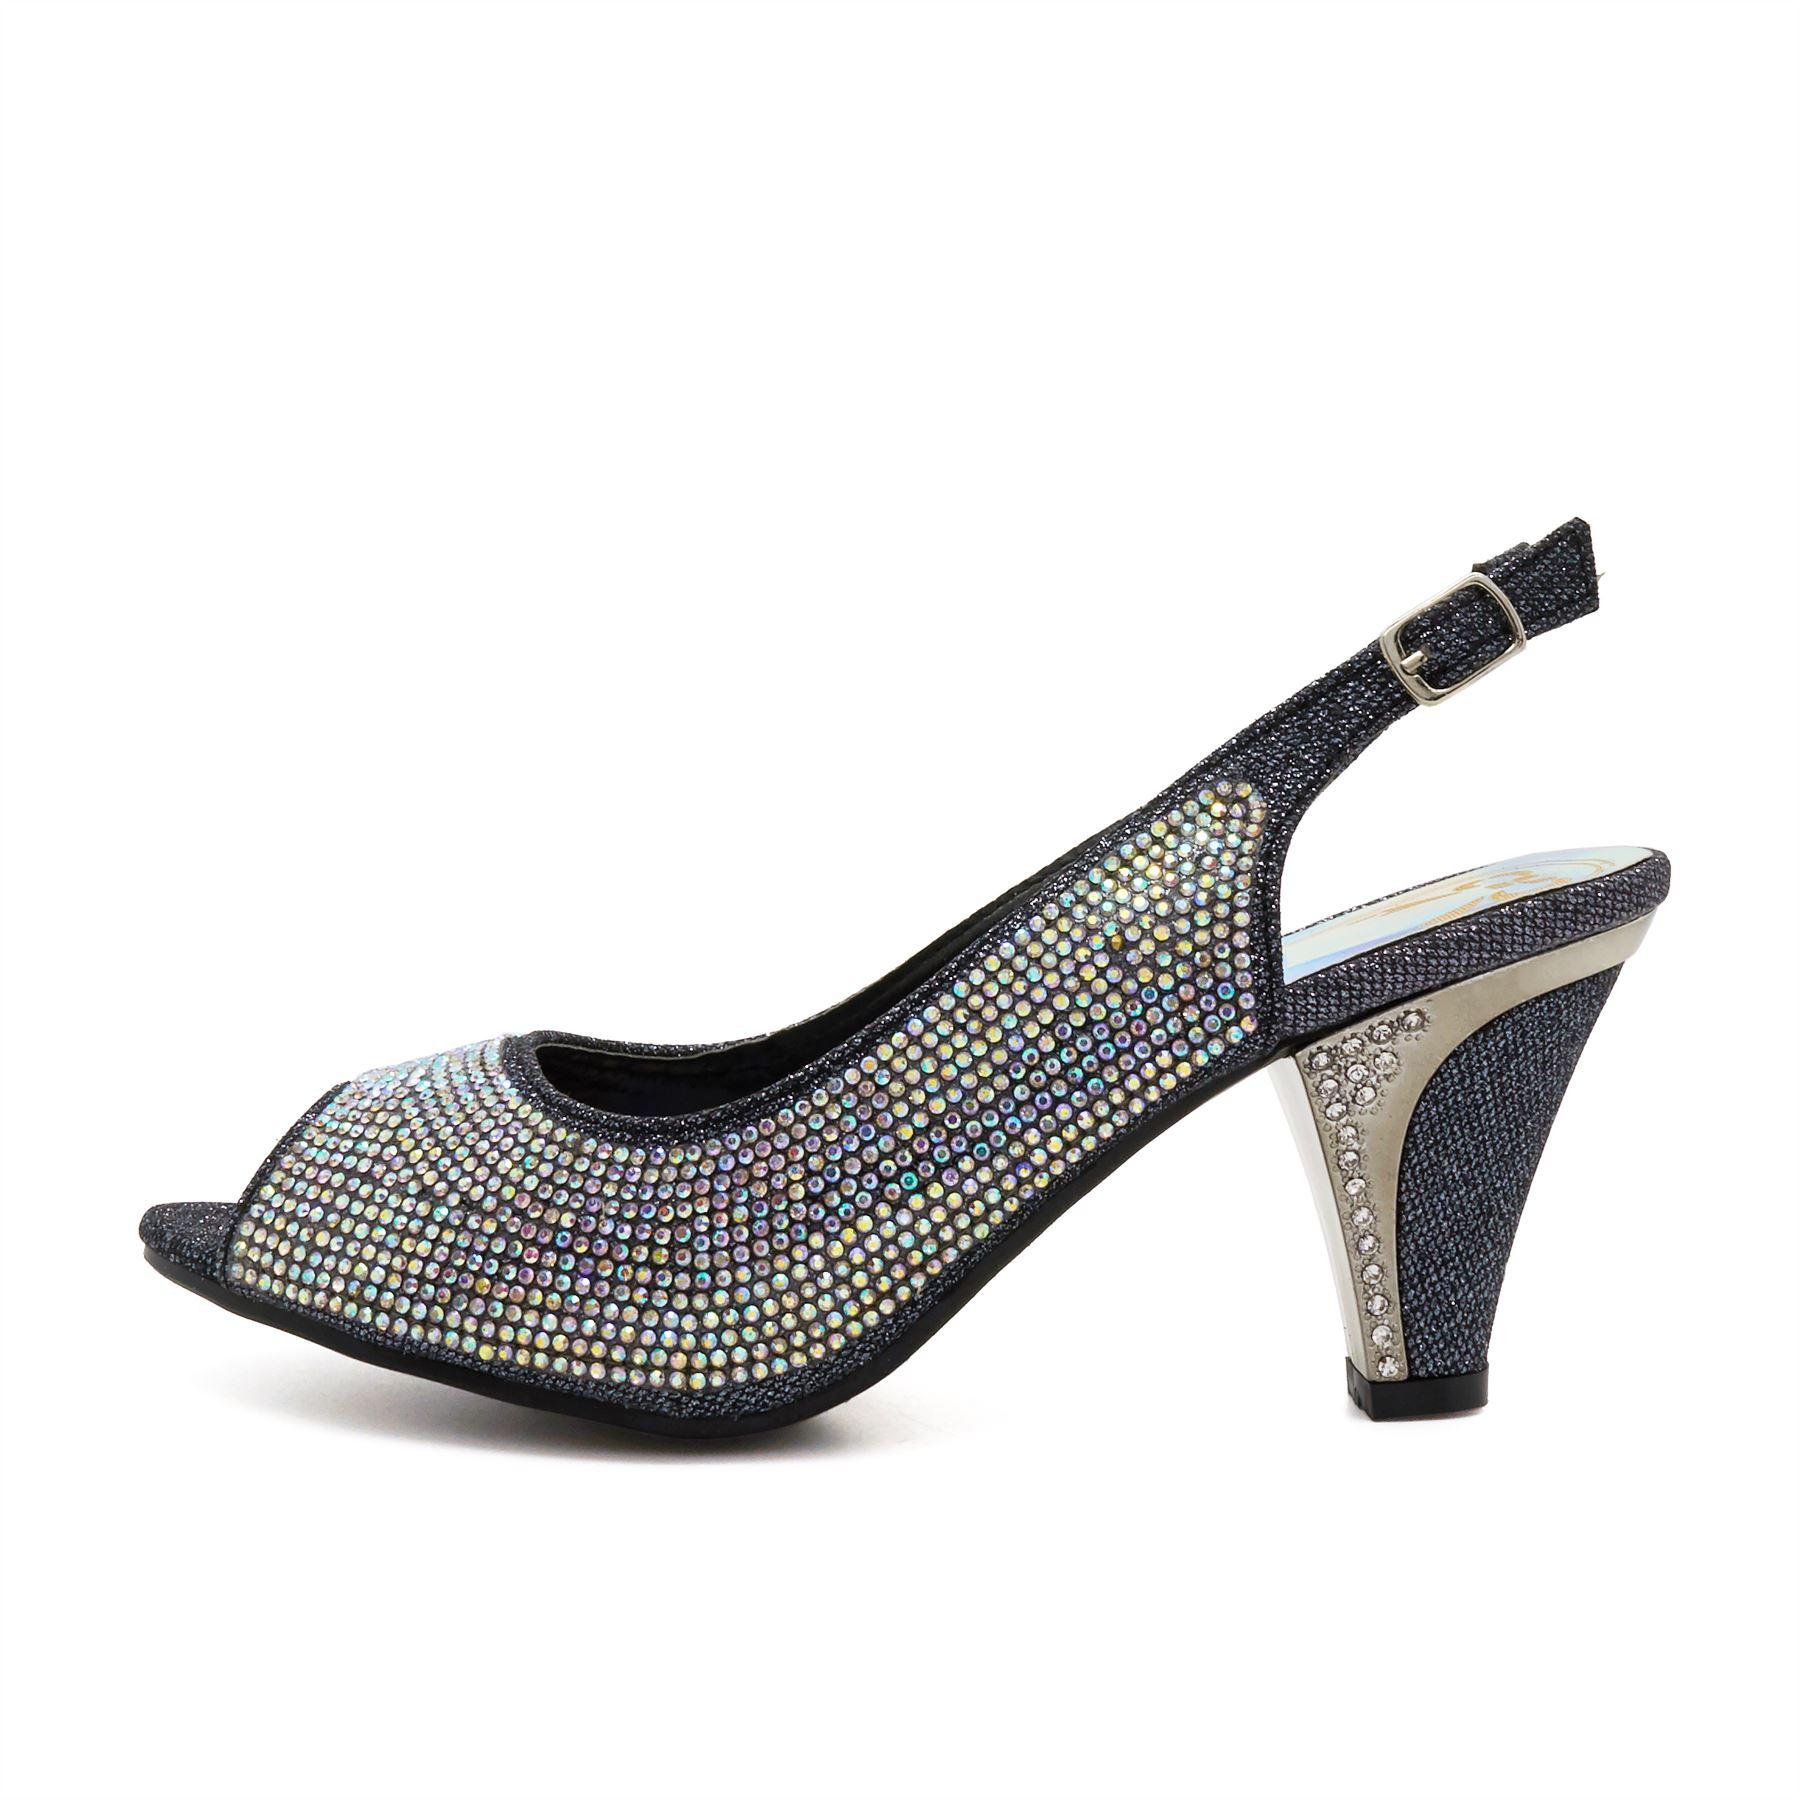 950058cff62 New Womens Diamante Low Mid Kitten Heels Sandals Ladies Bridal ...